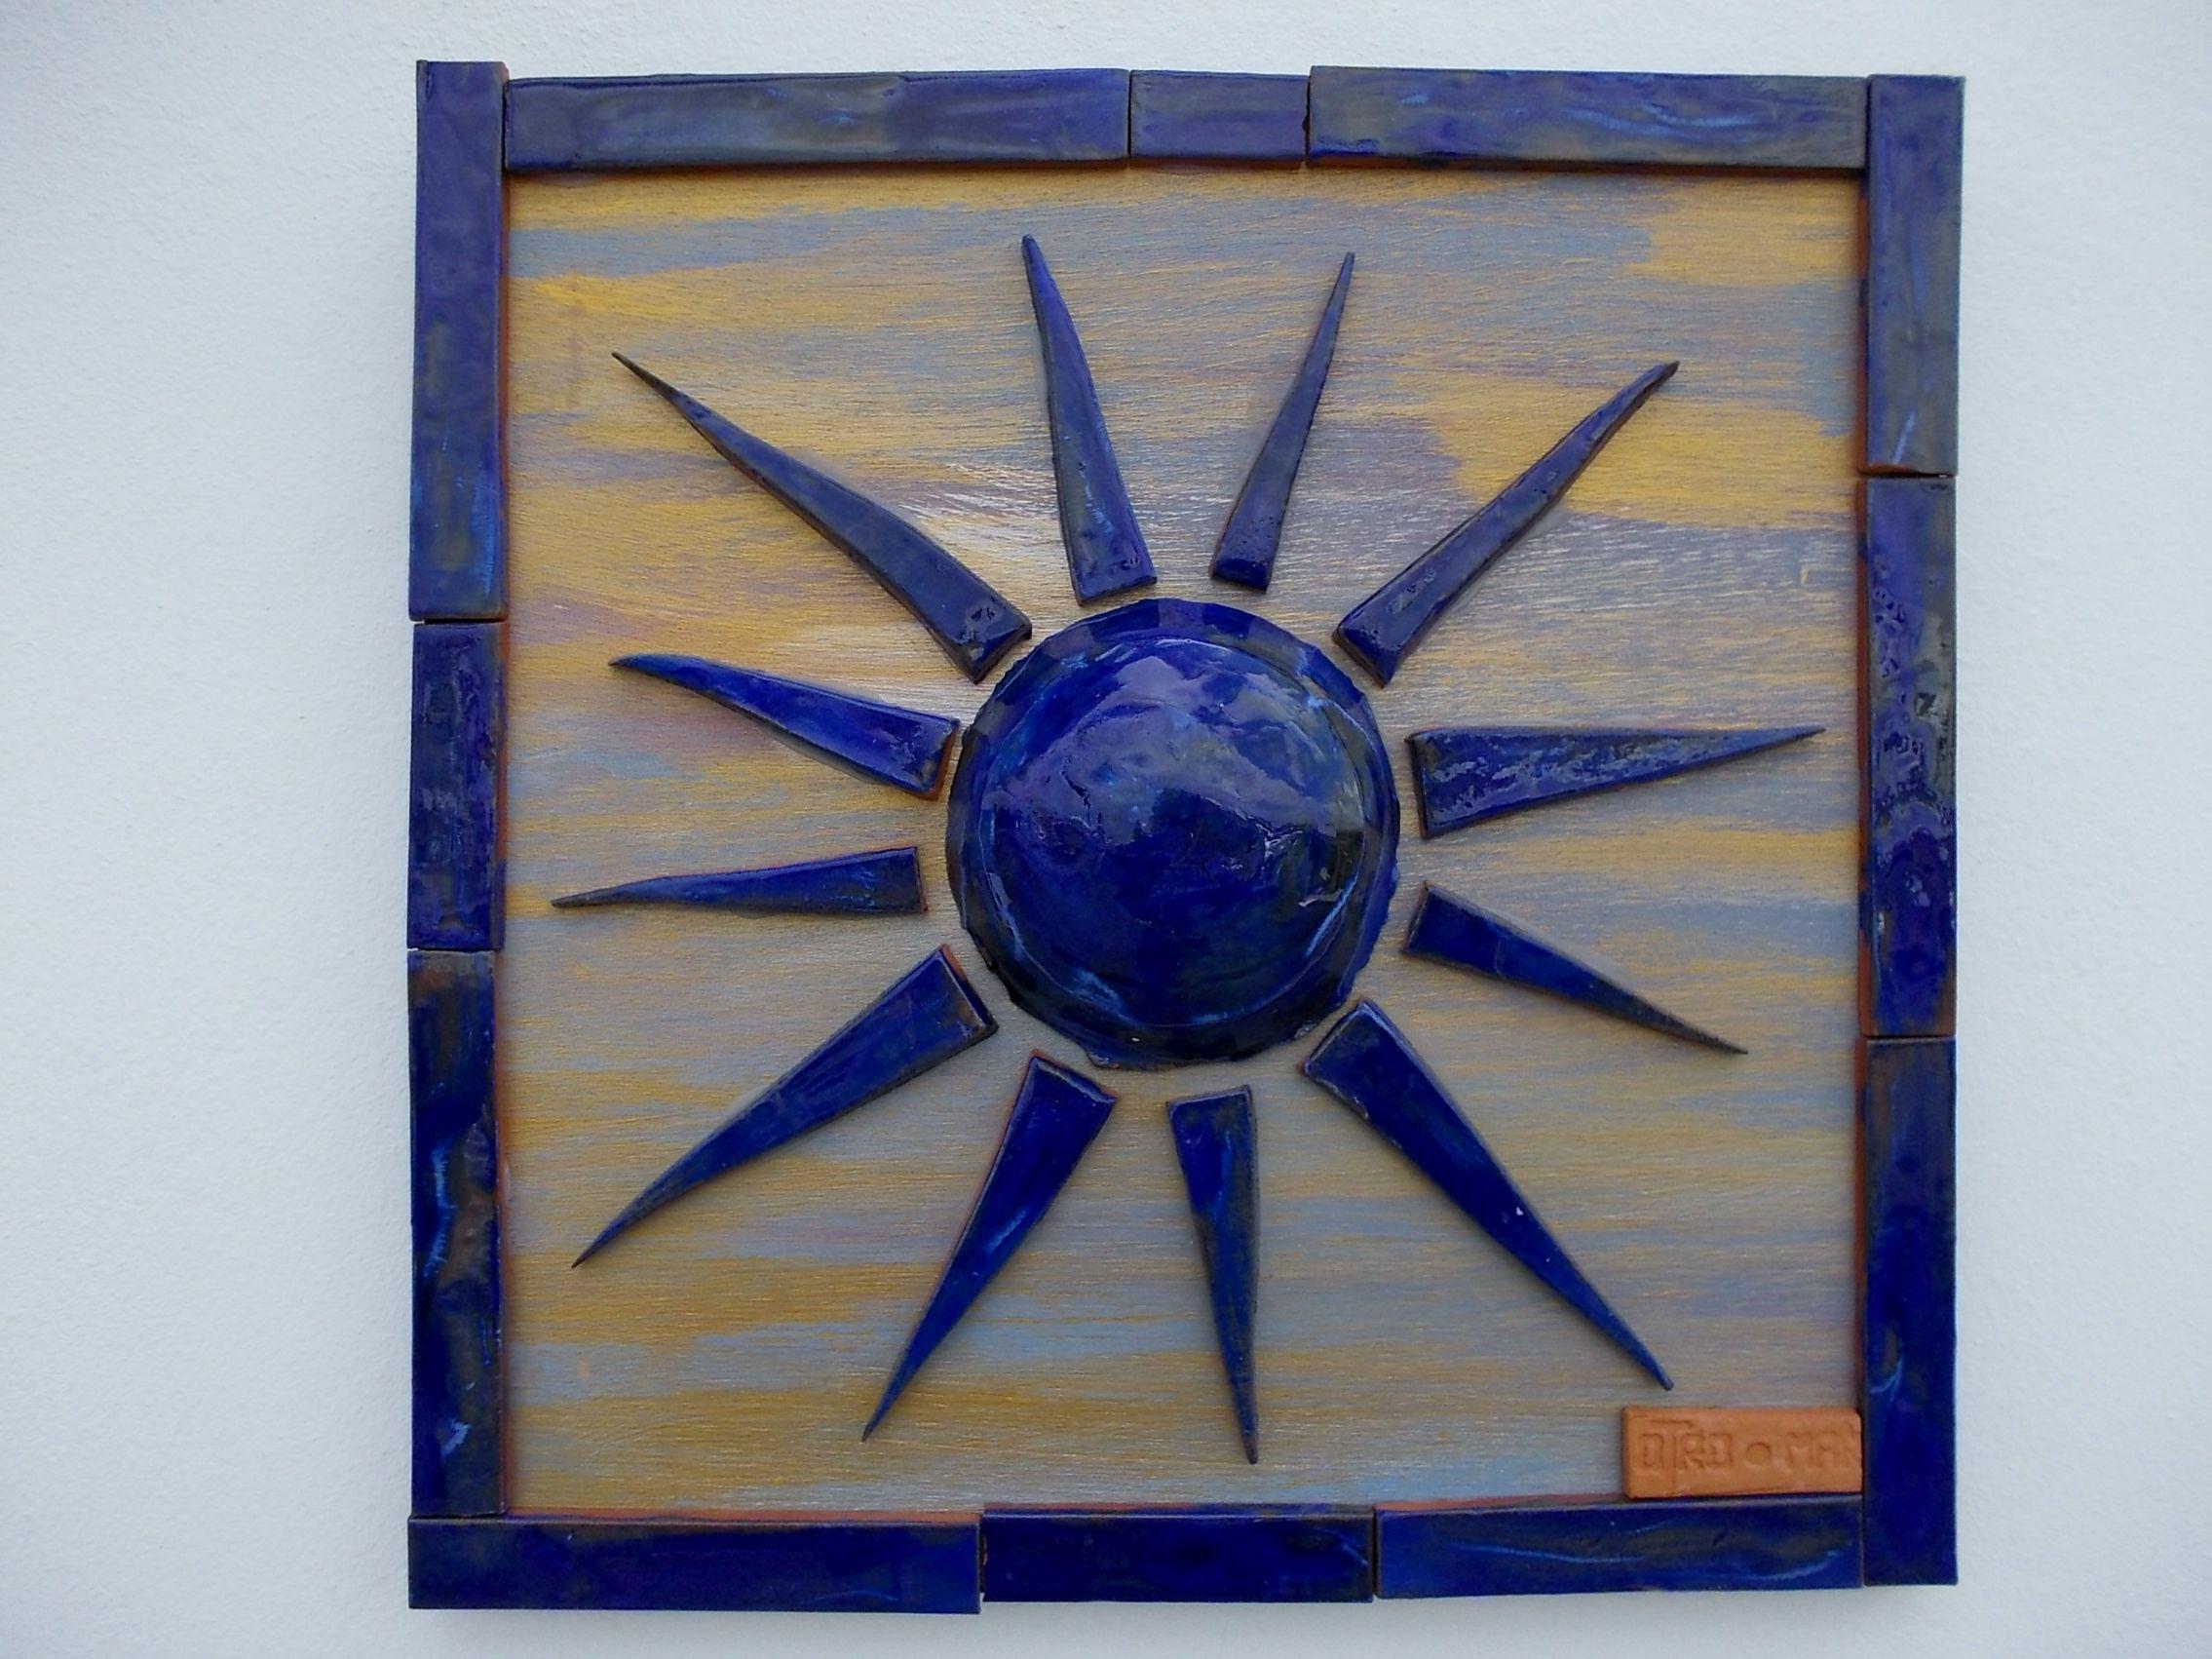 Handmade Ceramic Sun Wooden Hand Painted Base And Ceramic Frame 30